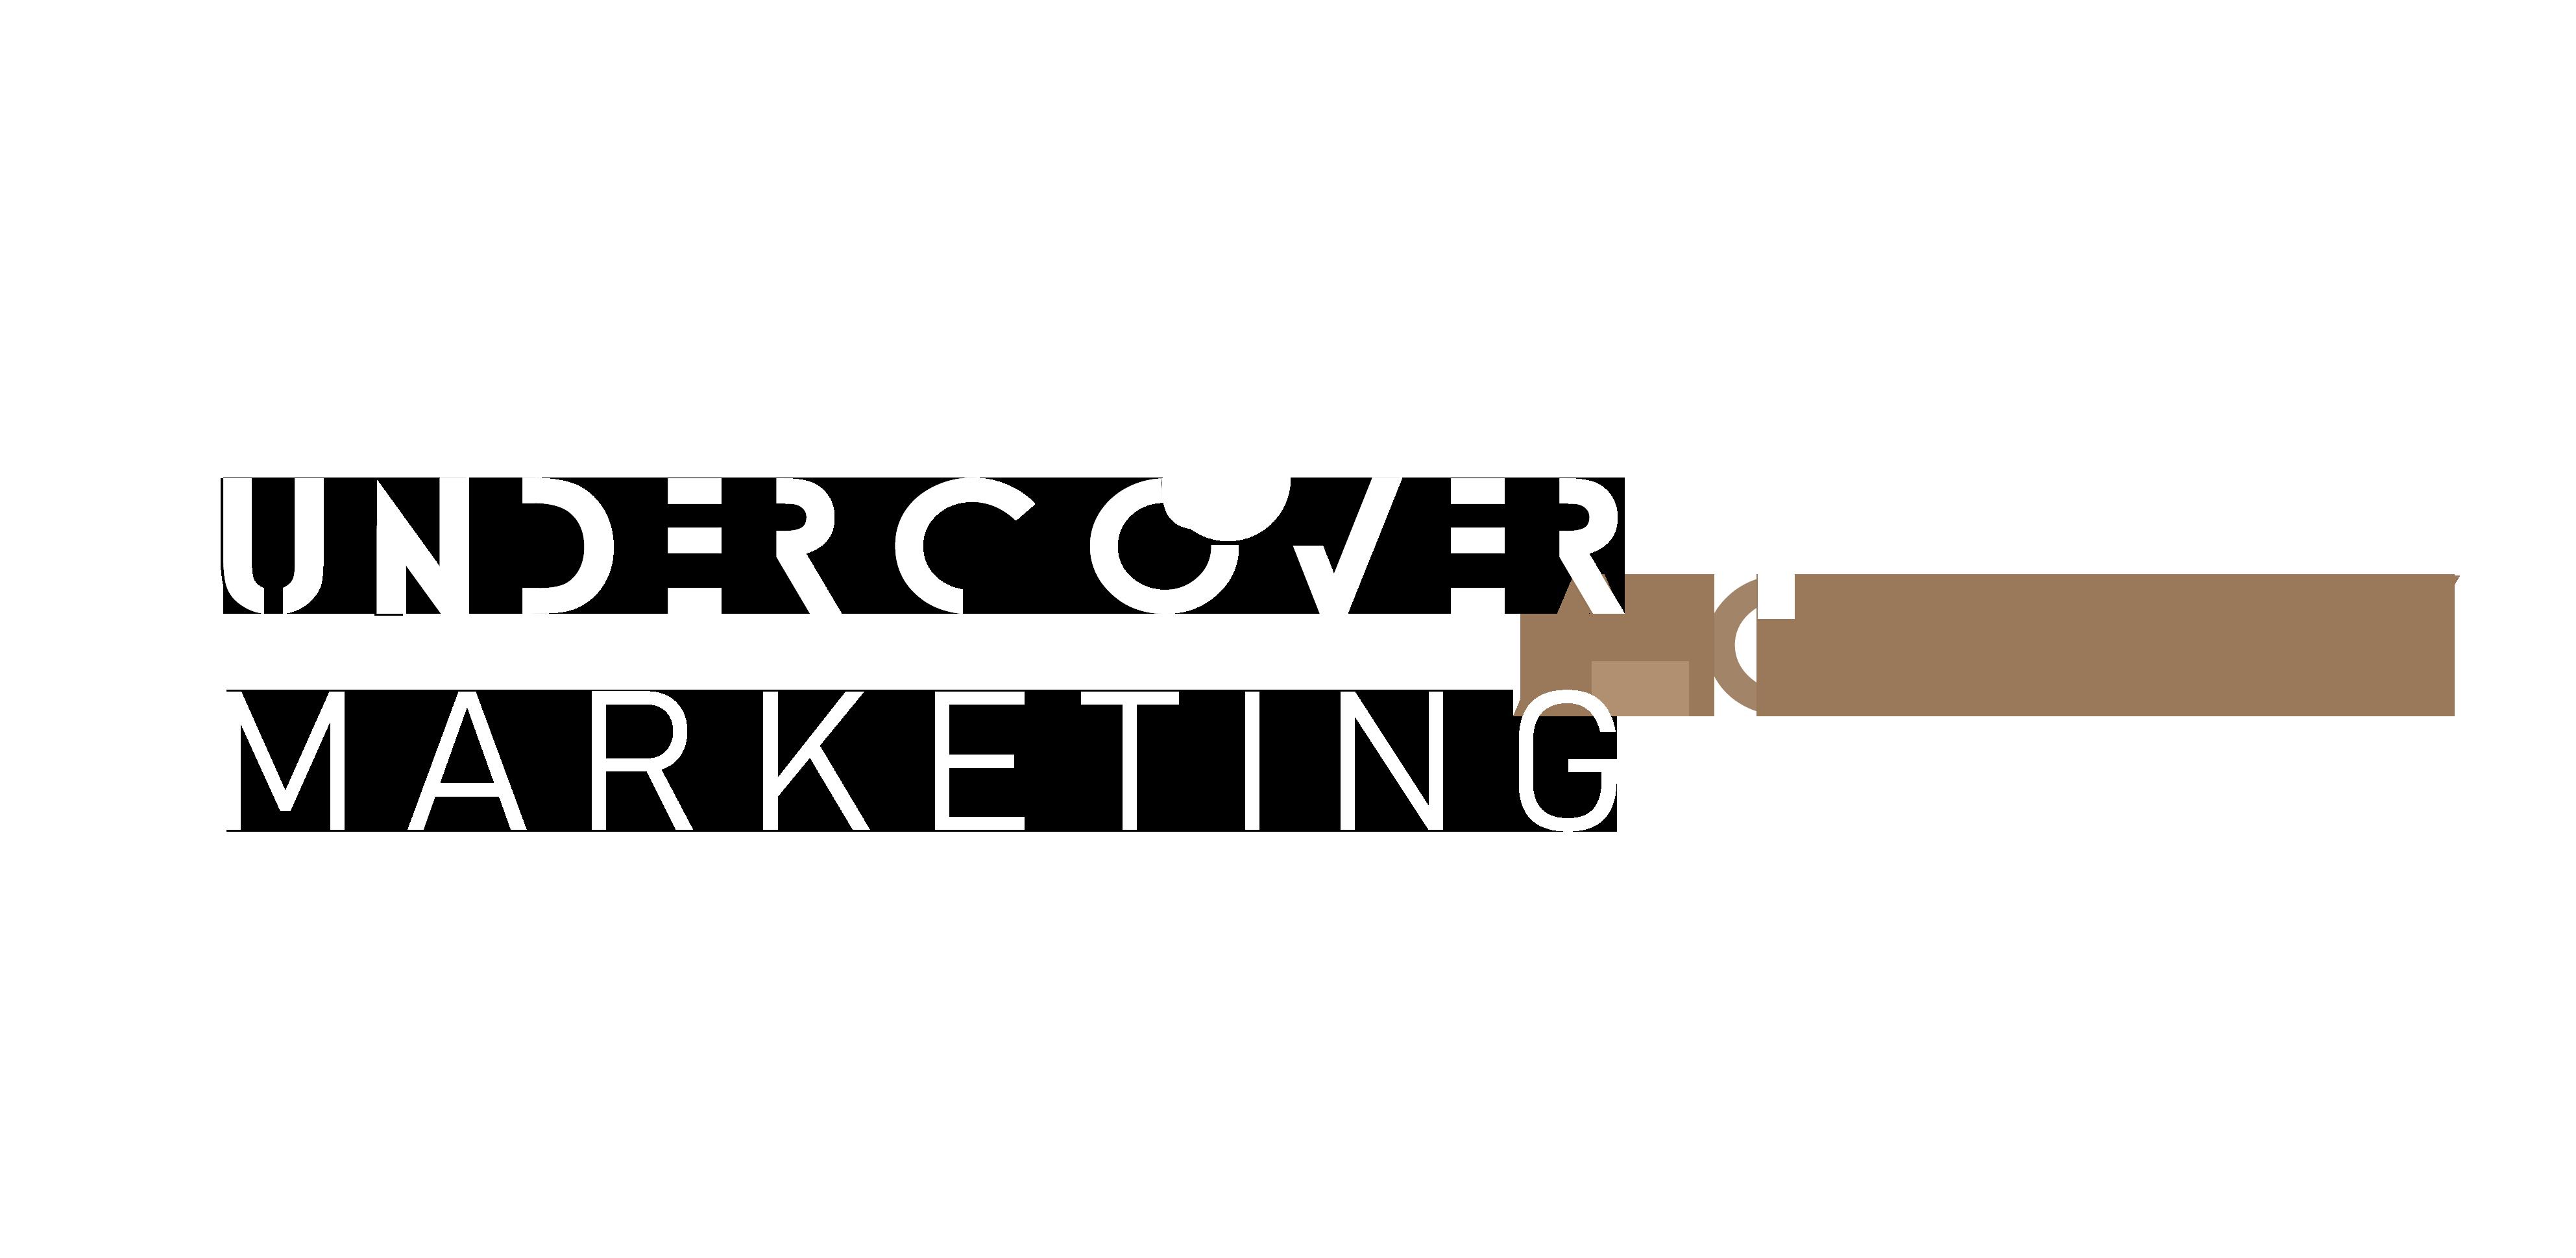 Undercover marketing media agency